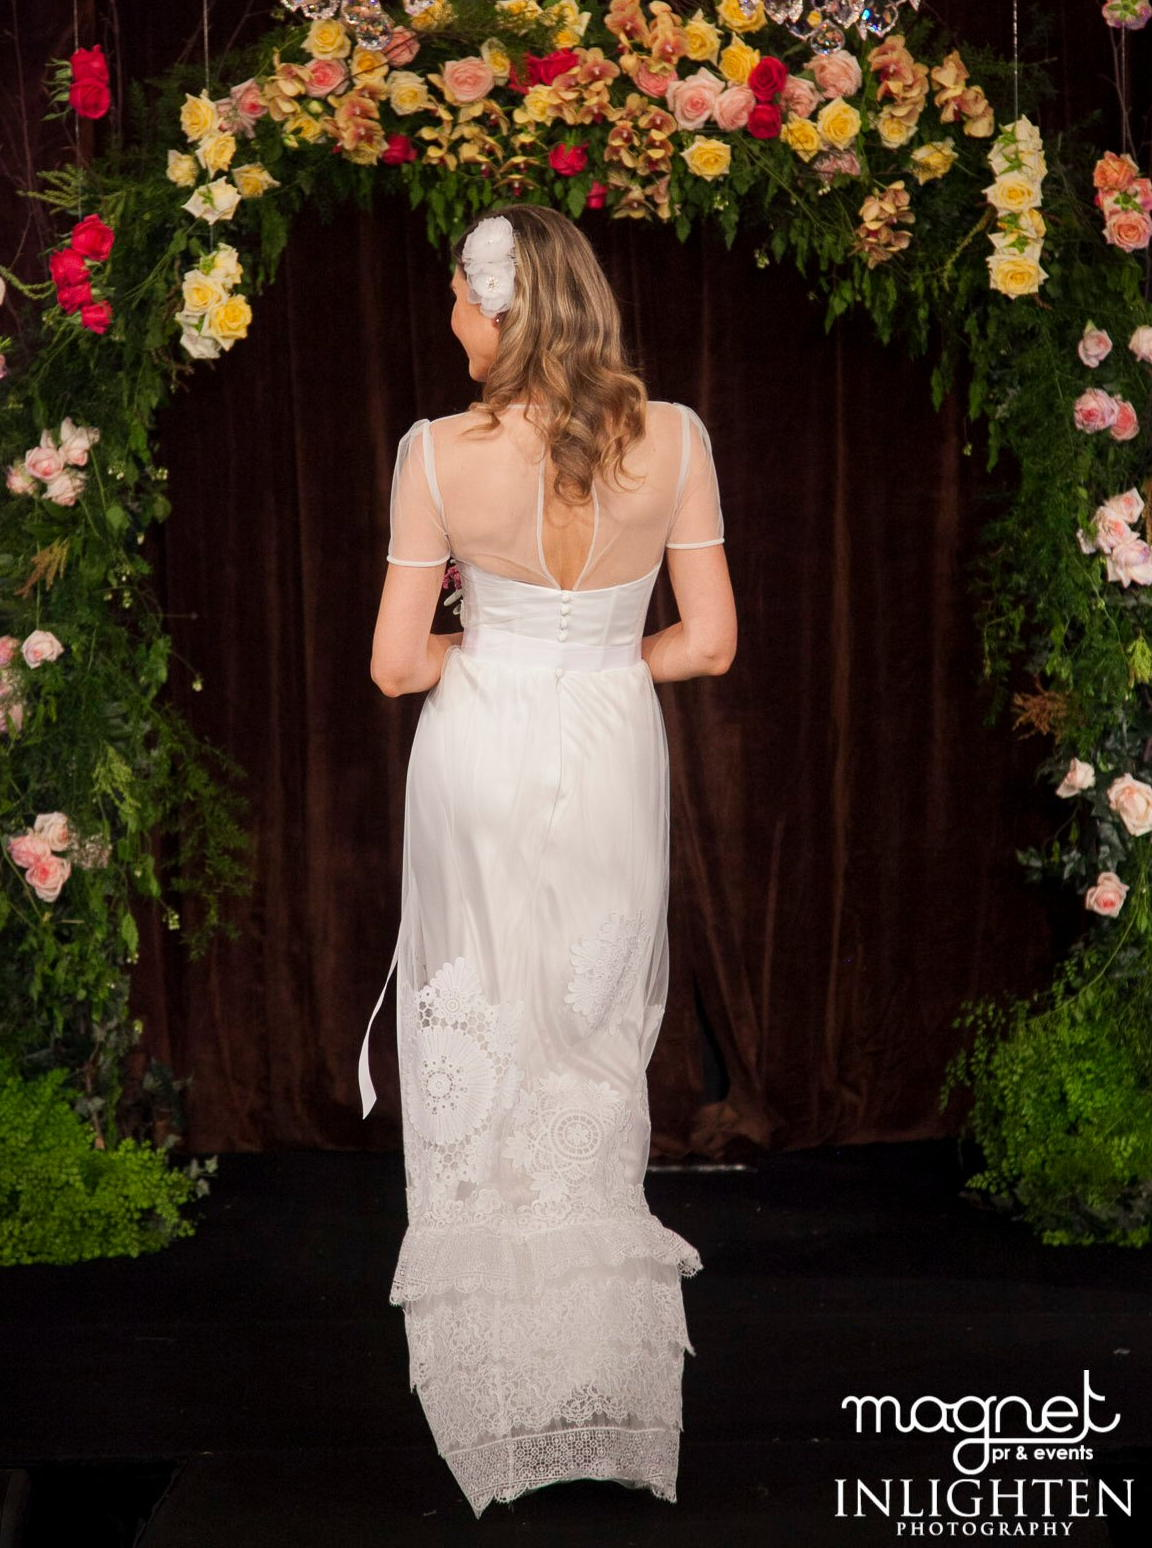 luce del sole tanya anic bridal ignite photography magnet PR sydney bridal (2).jpg